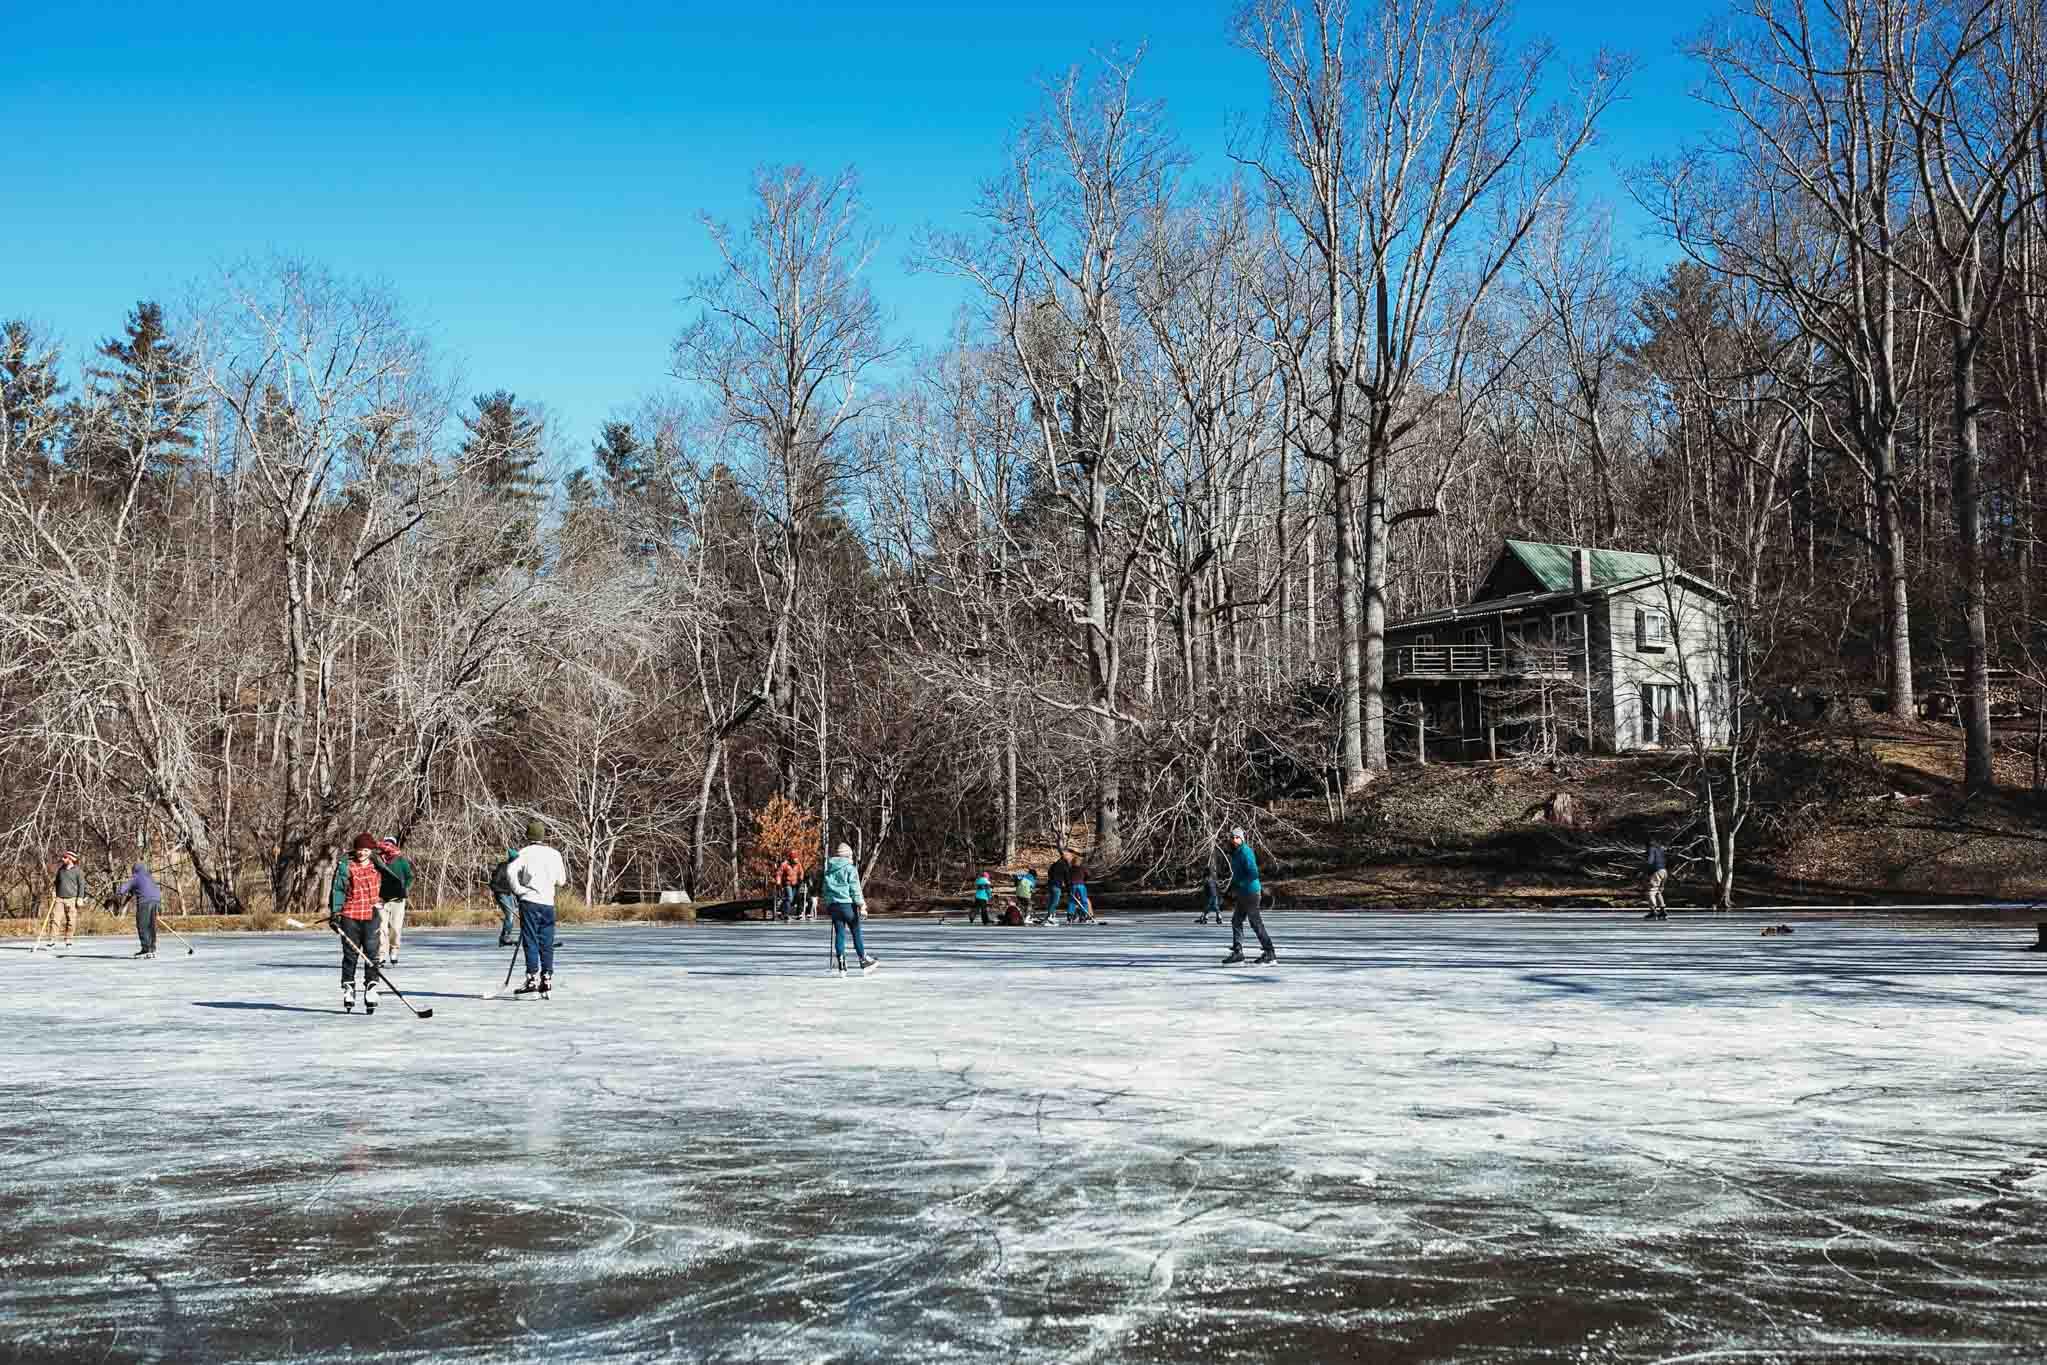 Hockey Game. Fairview, NC